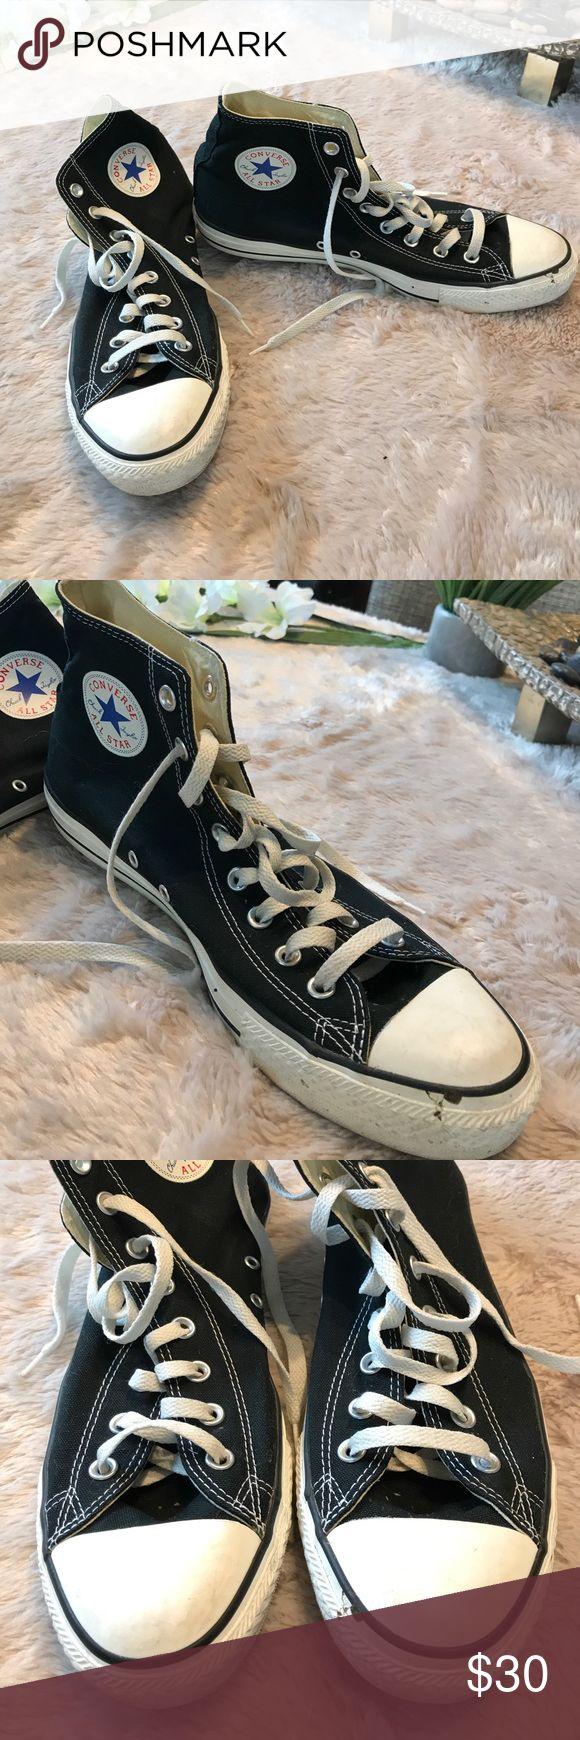 Black high top Men's converse tennis shoes Slightly worn high top men's converse sneakers Converse Shoes Sneakers